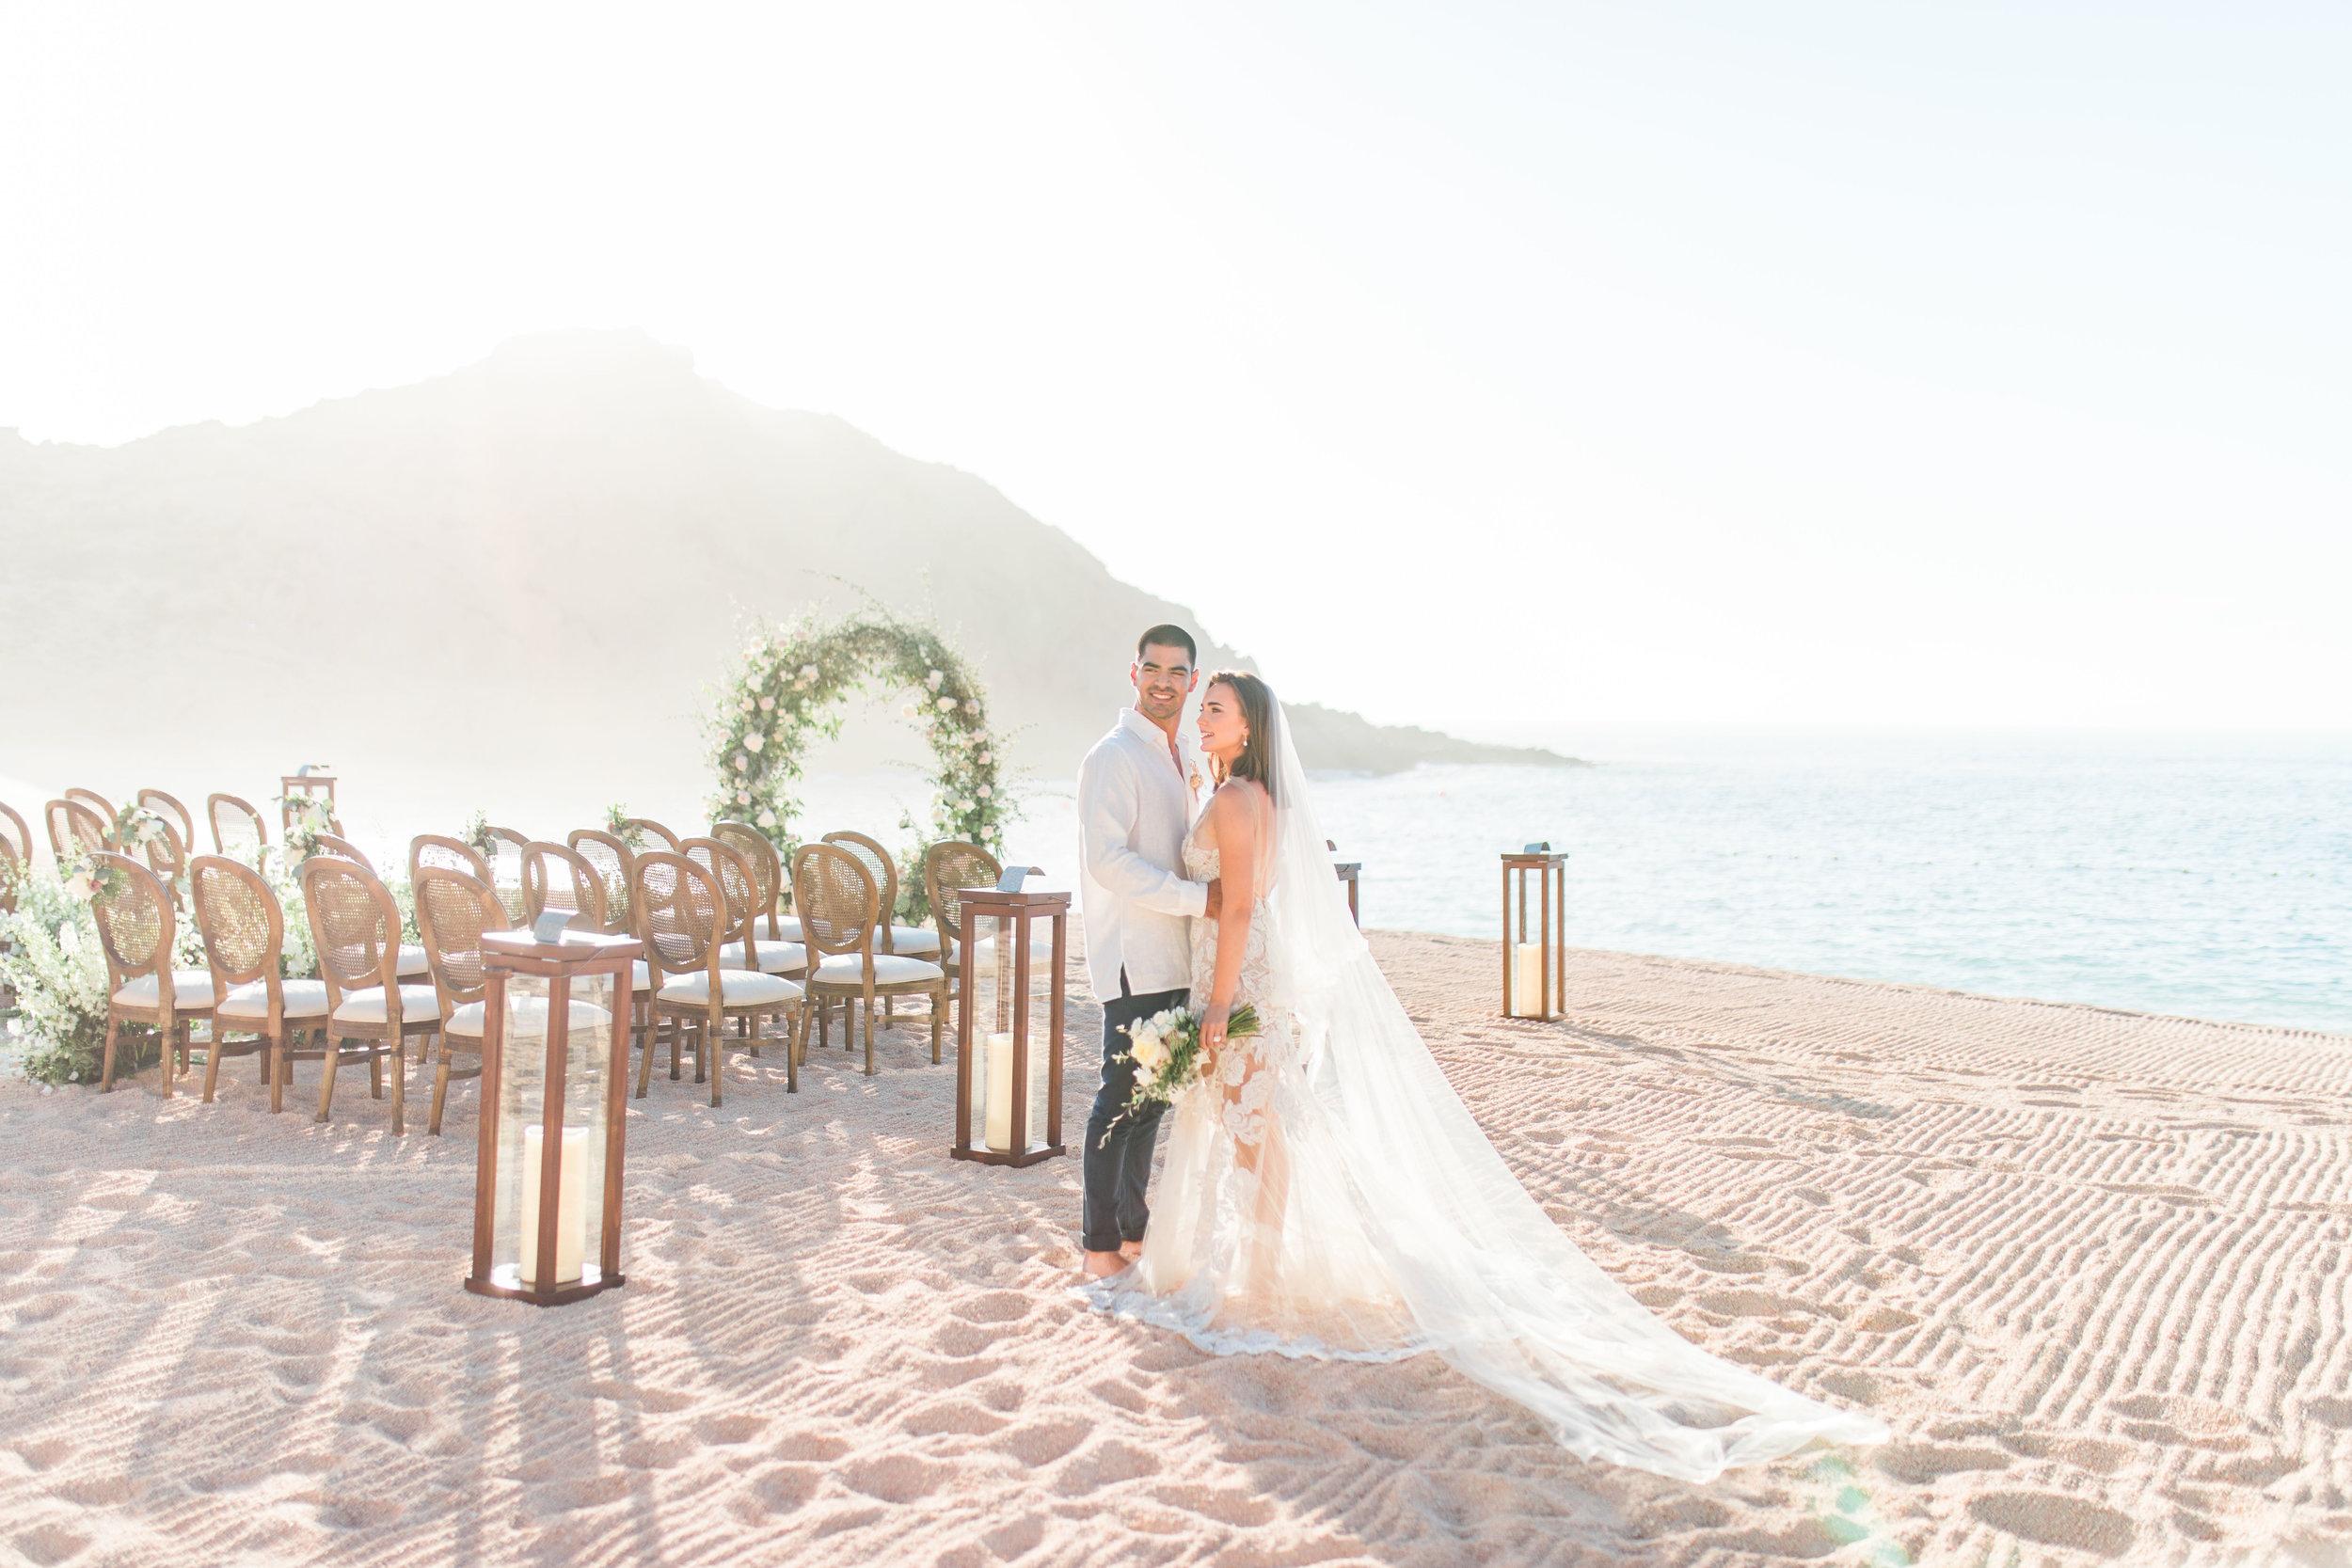 Montage-Cabo-Wedding-Photos-JBJ-Pictures-28.jpg